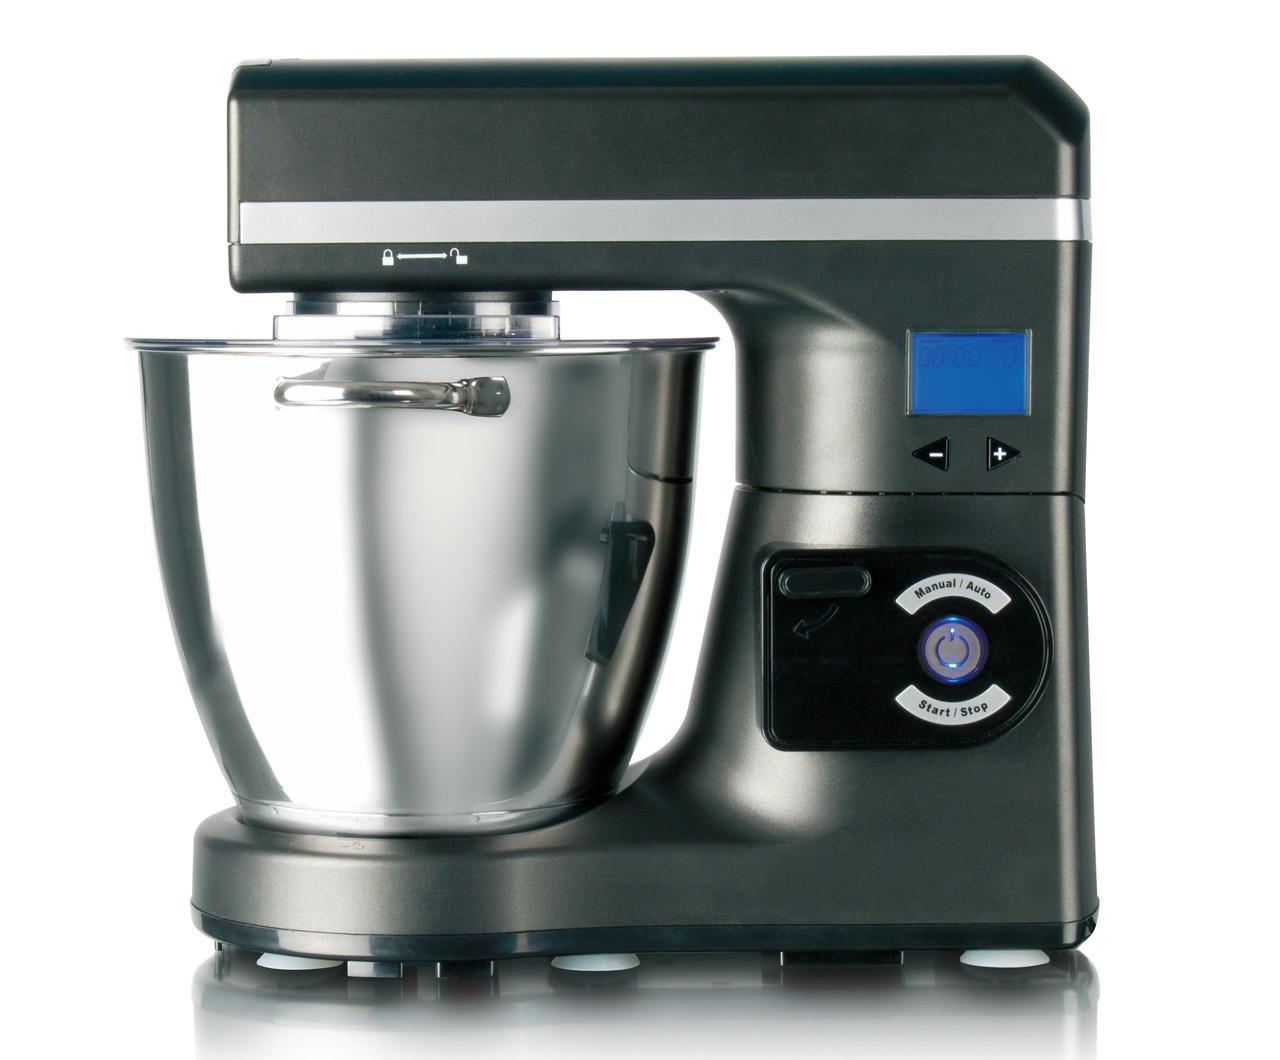 Оптом и розницу тестомешалка - планетарный миксер Akita jp Itpasta Mixer Professional чаша 7 литров